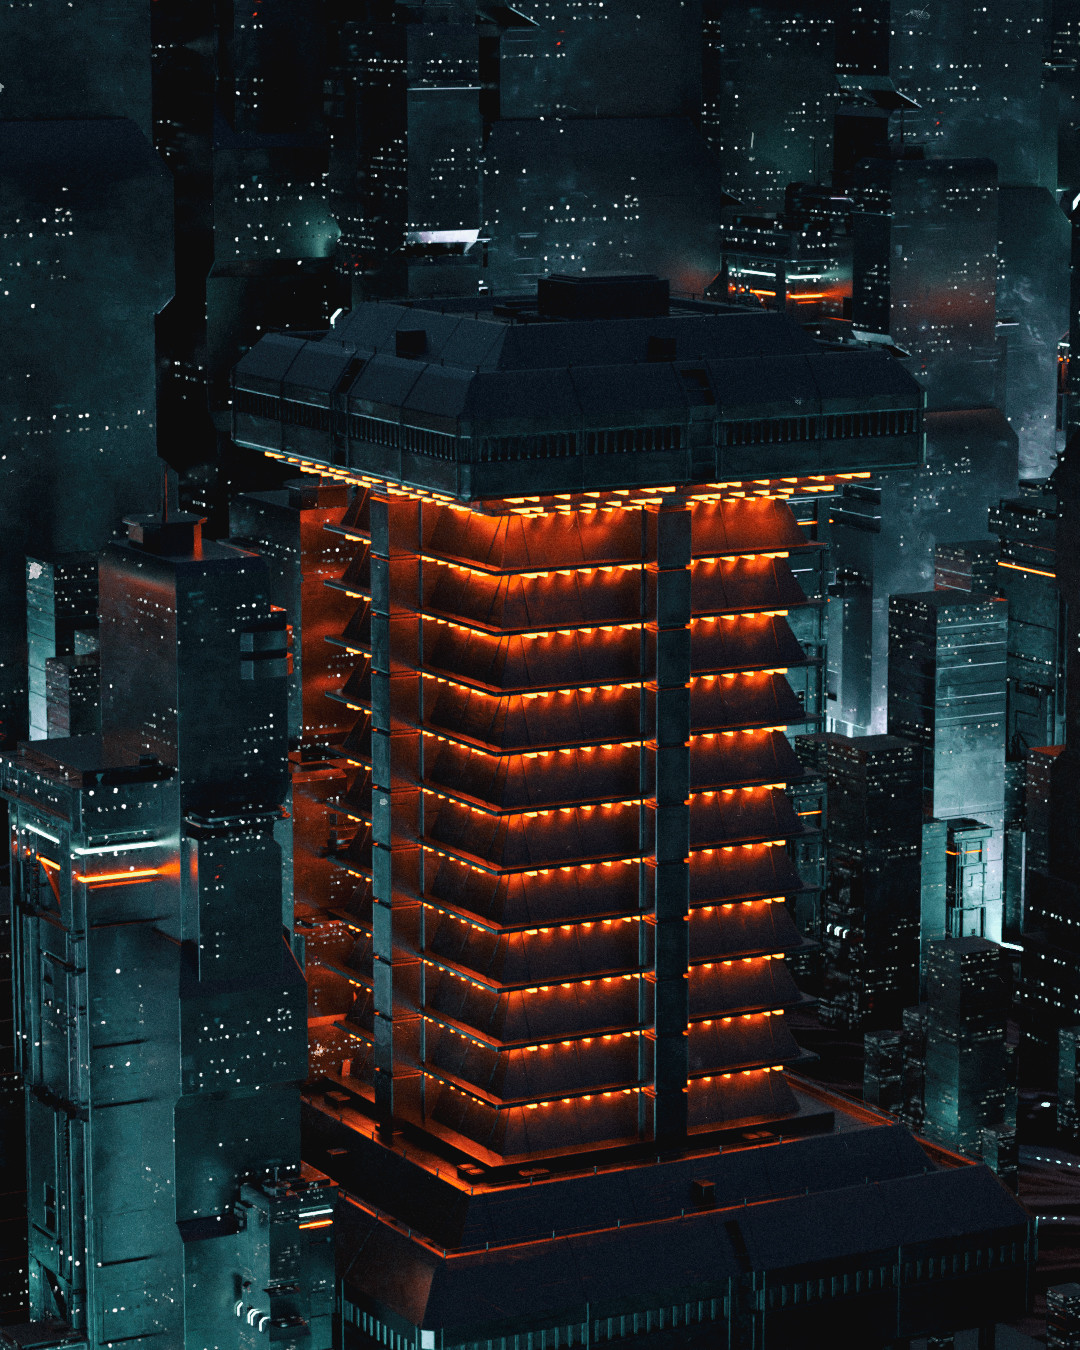 //Not Another Cyberpunk Cityscape